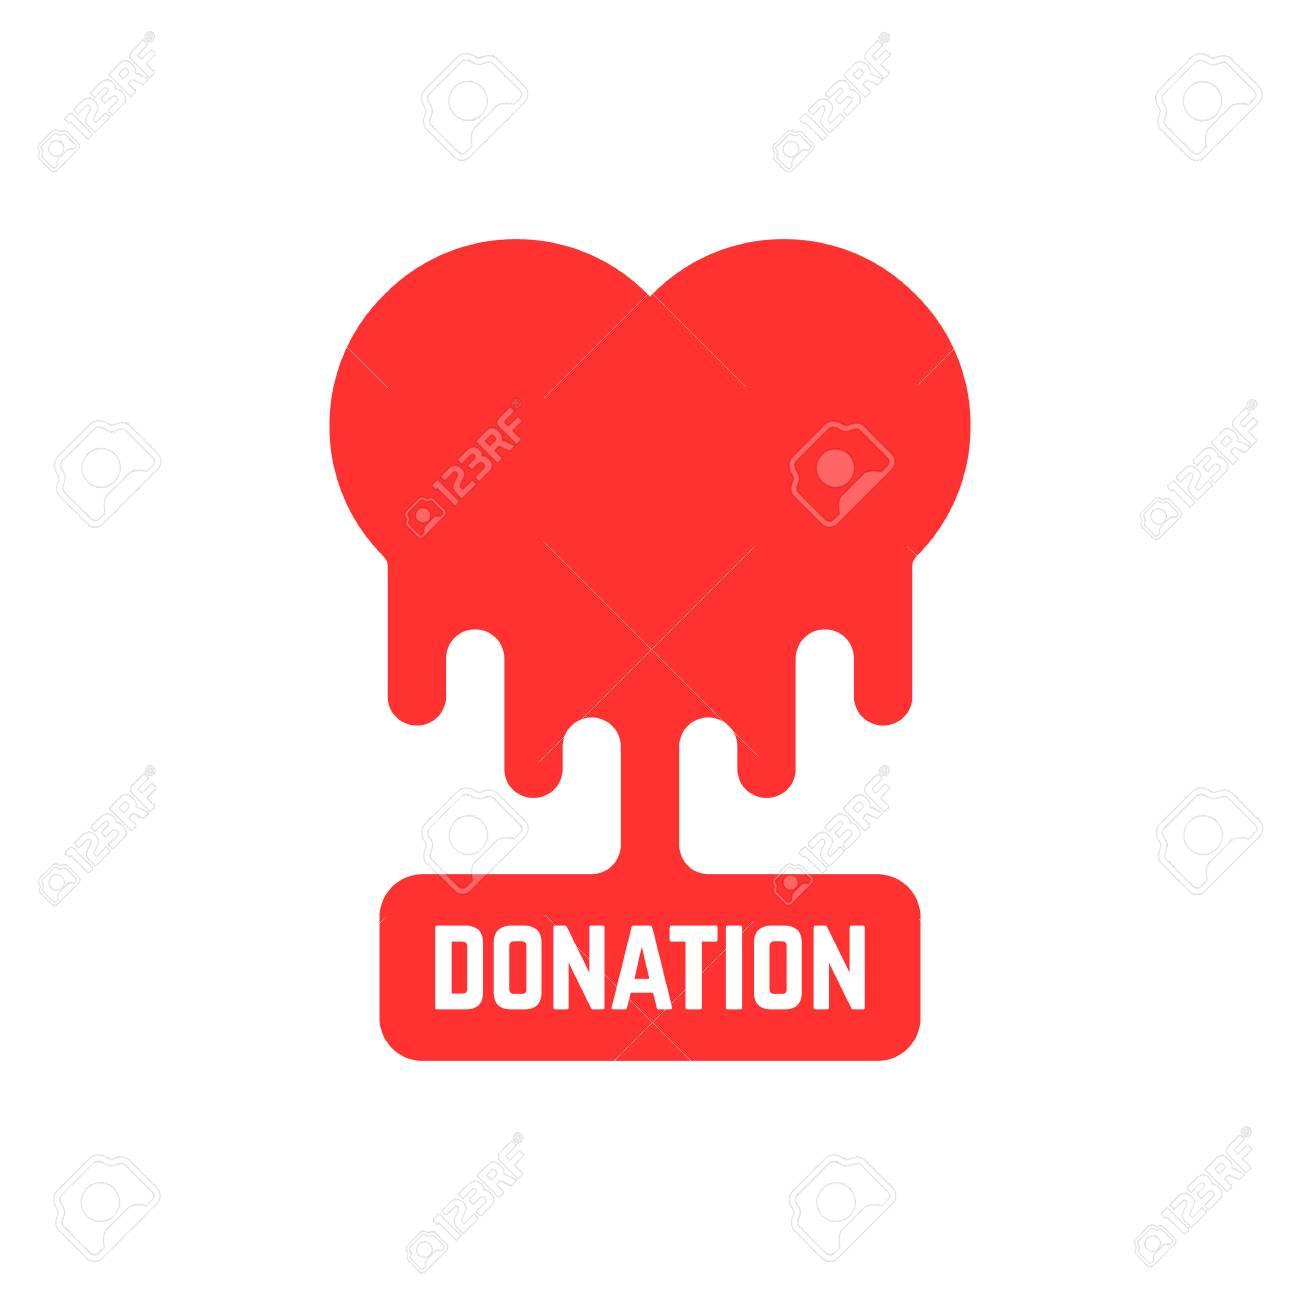 Donation icon with bleeding heart royalty free cliparts vectors donation icon with bleeding heart stock vector 72443958 buycottarizona